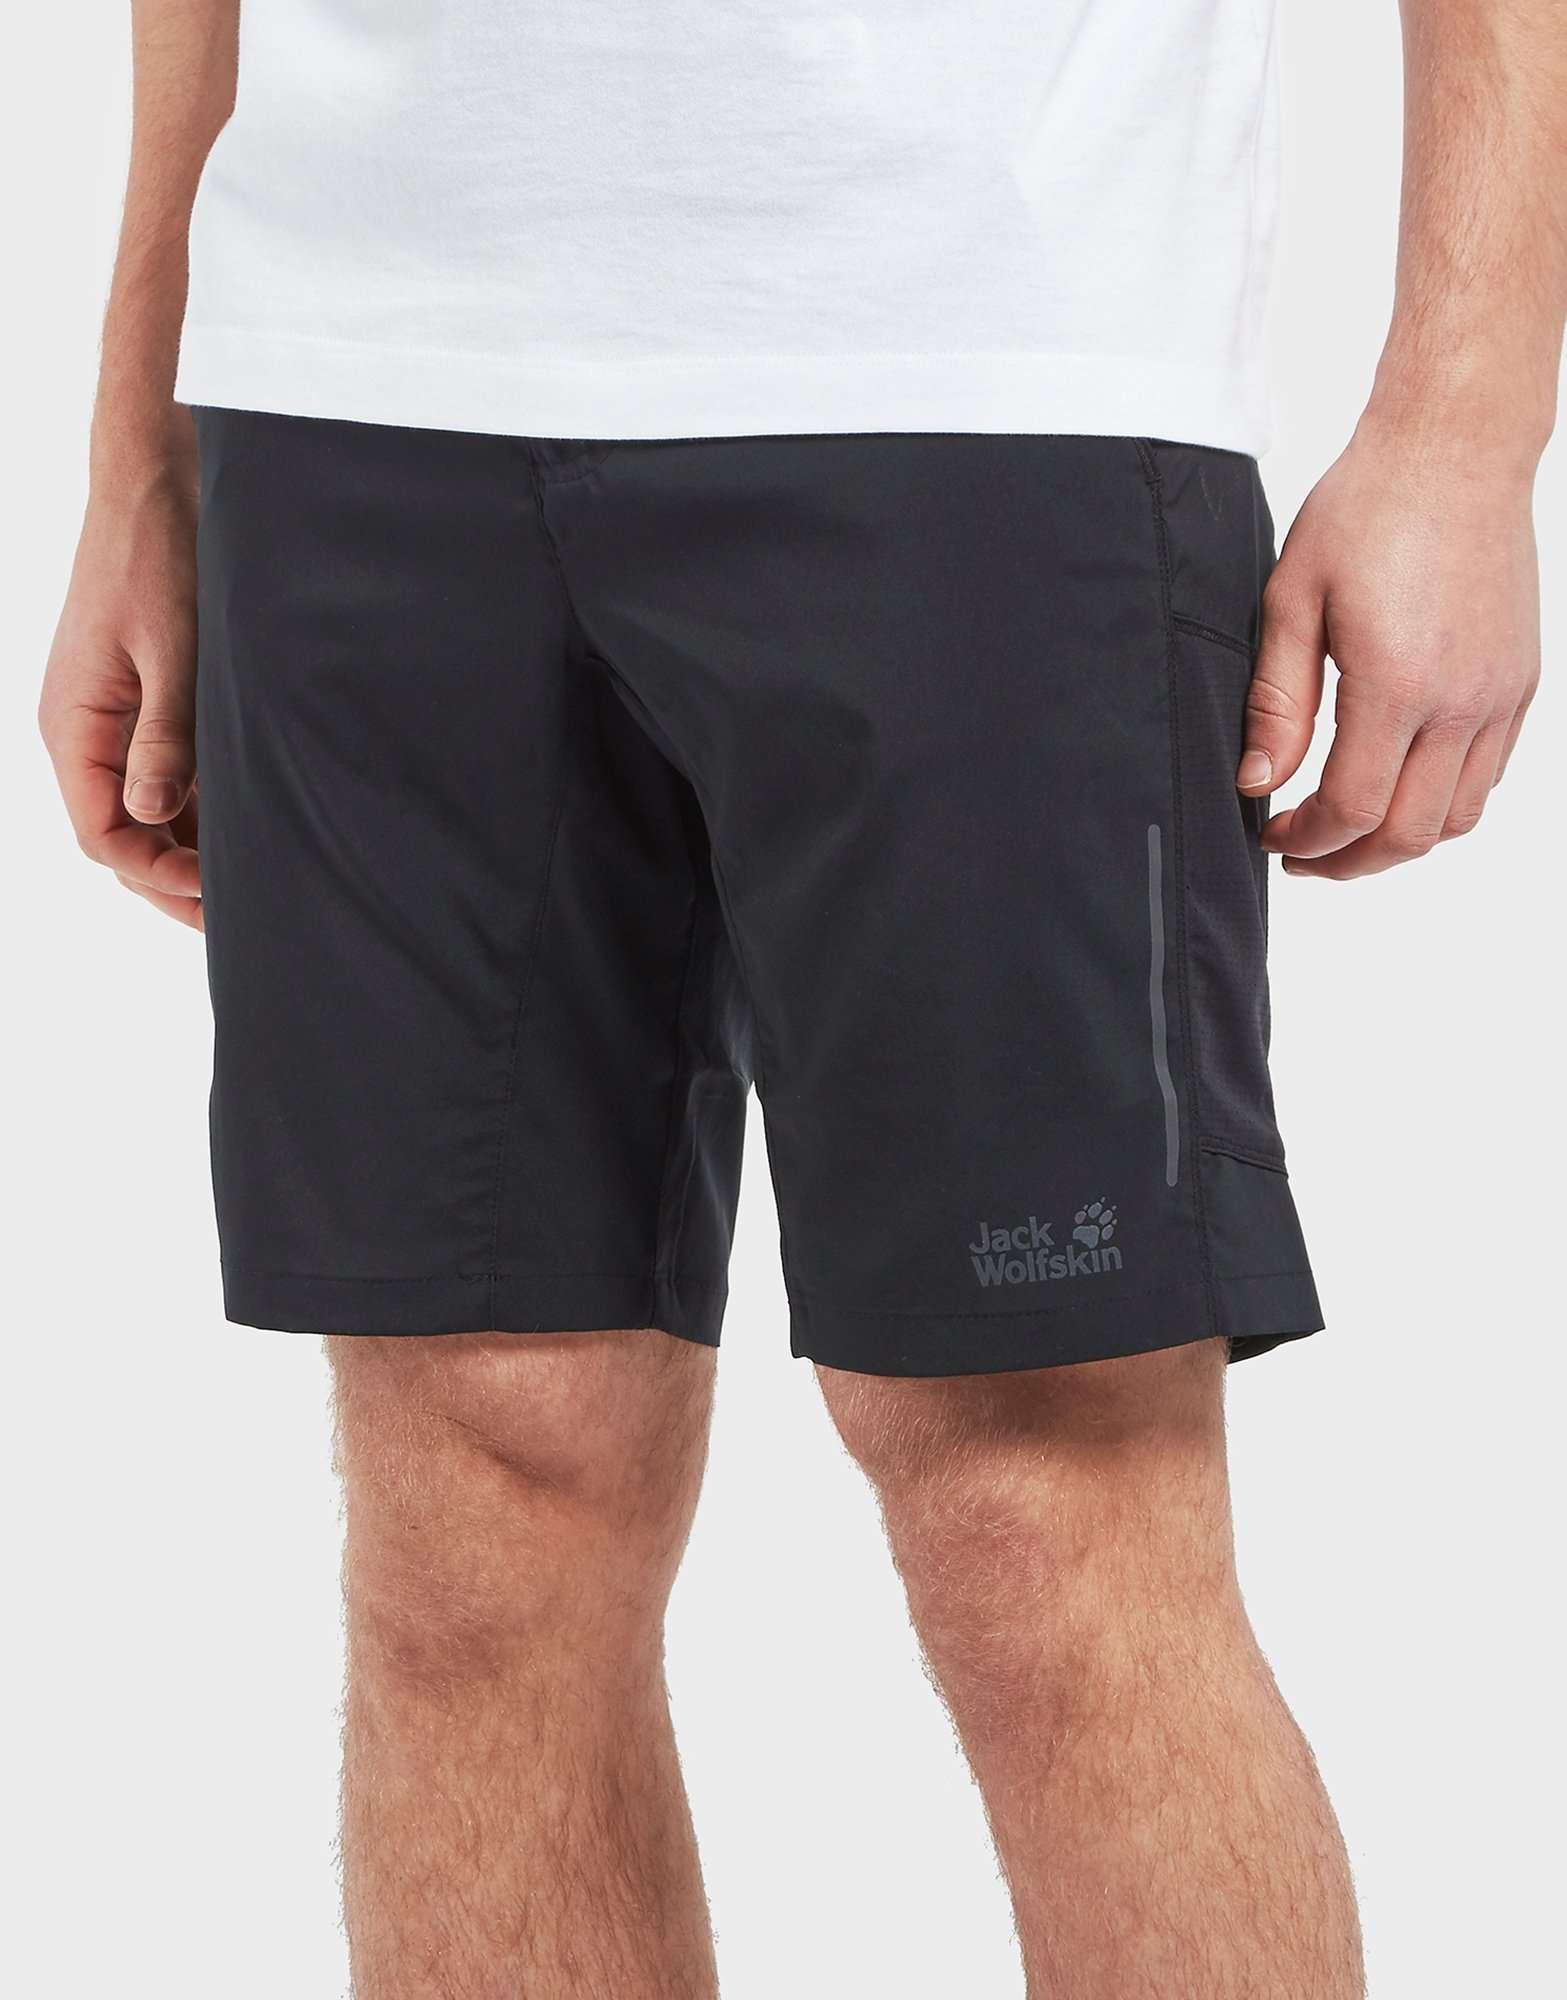 Jack Wolfskin Trail Tech Mesh Shorts